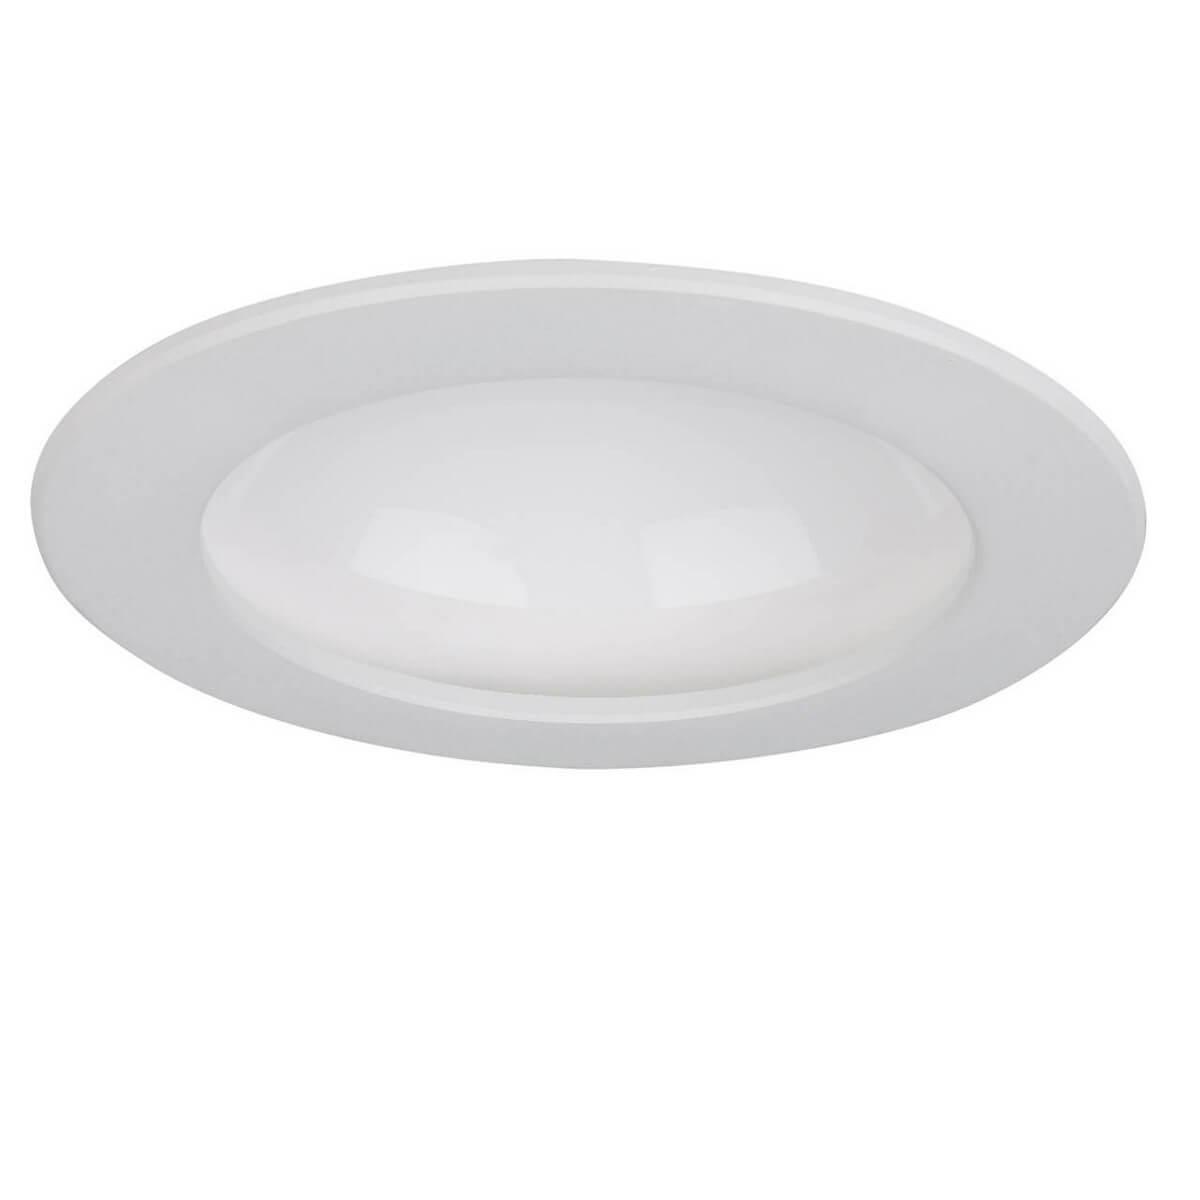 Светильник Lightstar 220124 Riverbe Piccolo